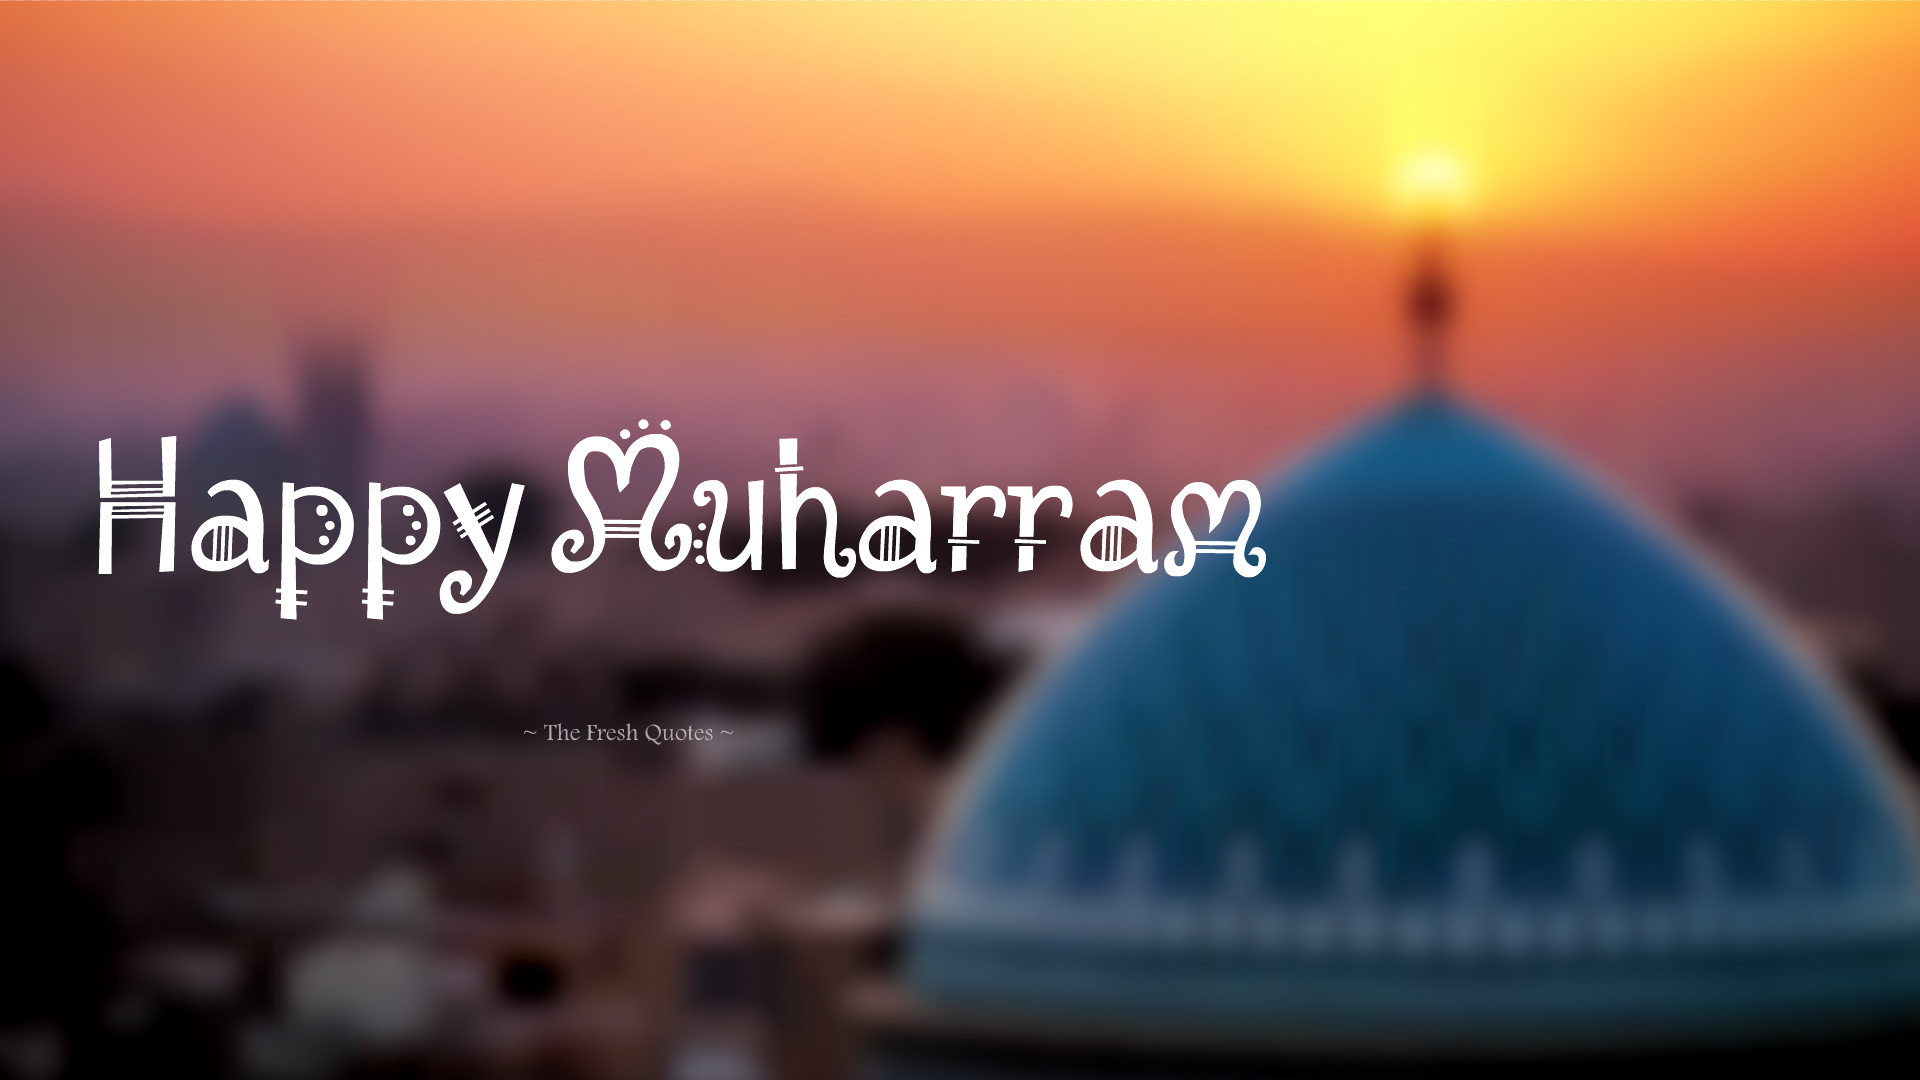 Hppy Muharram Free Quotes